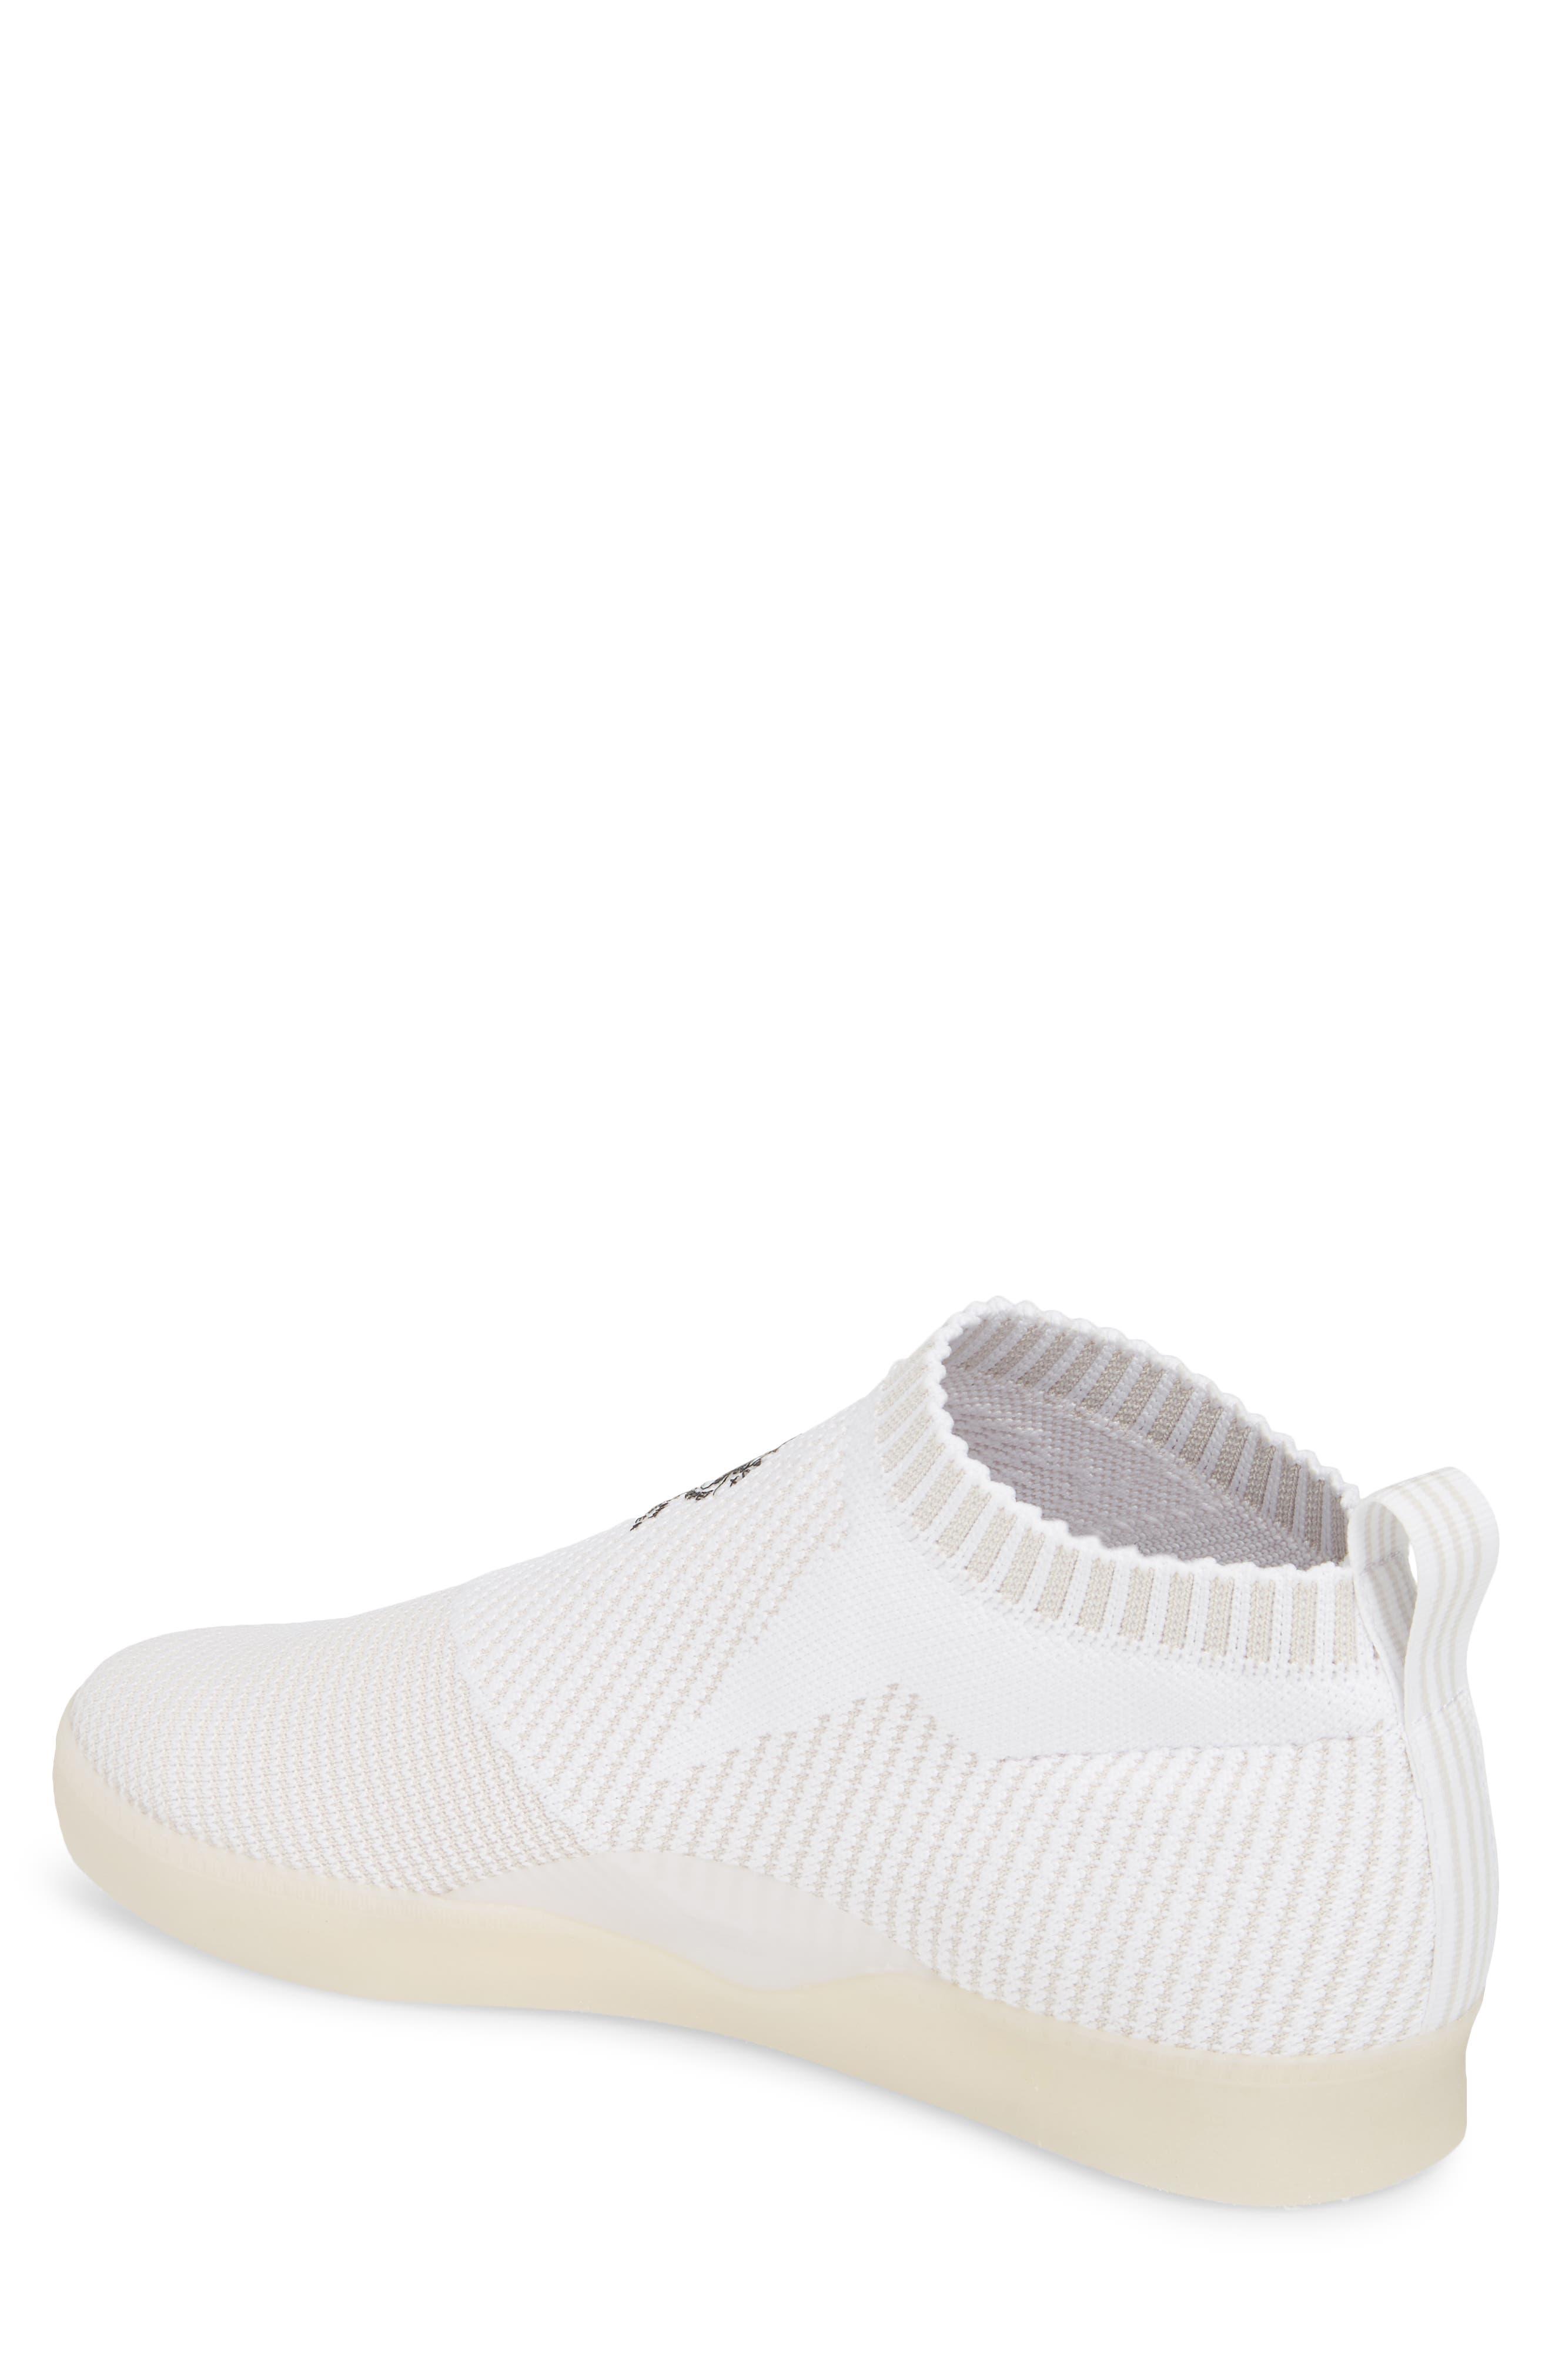 3ST.002 Primeknit Skateboarding Shoe,                             Alternate thumbnail 2, color,                             White / Grey/ Black